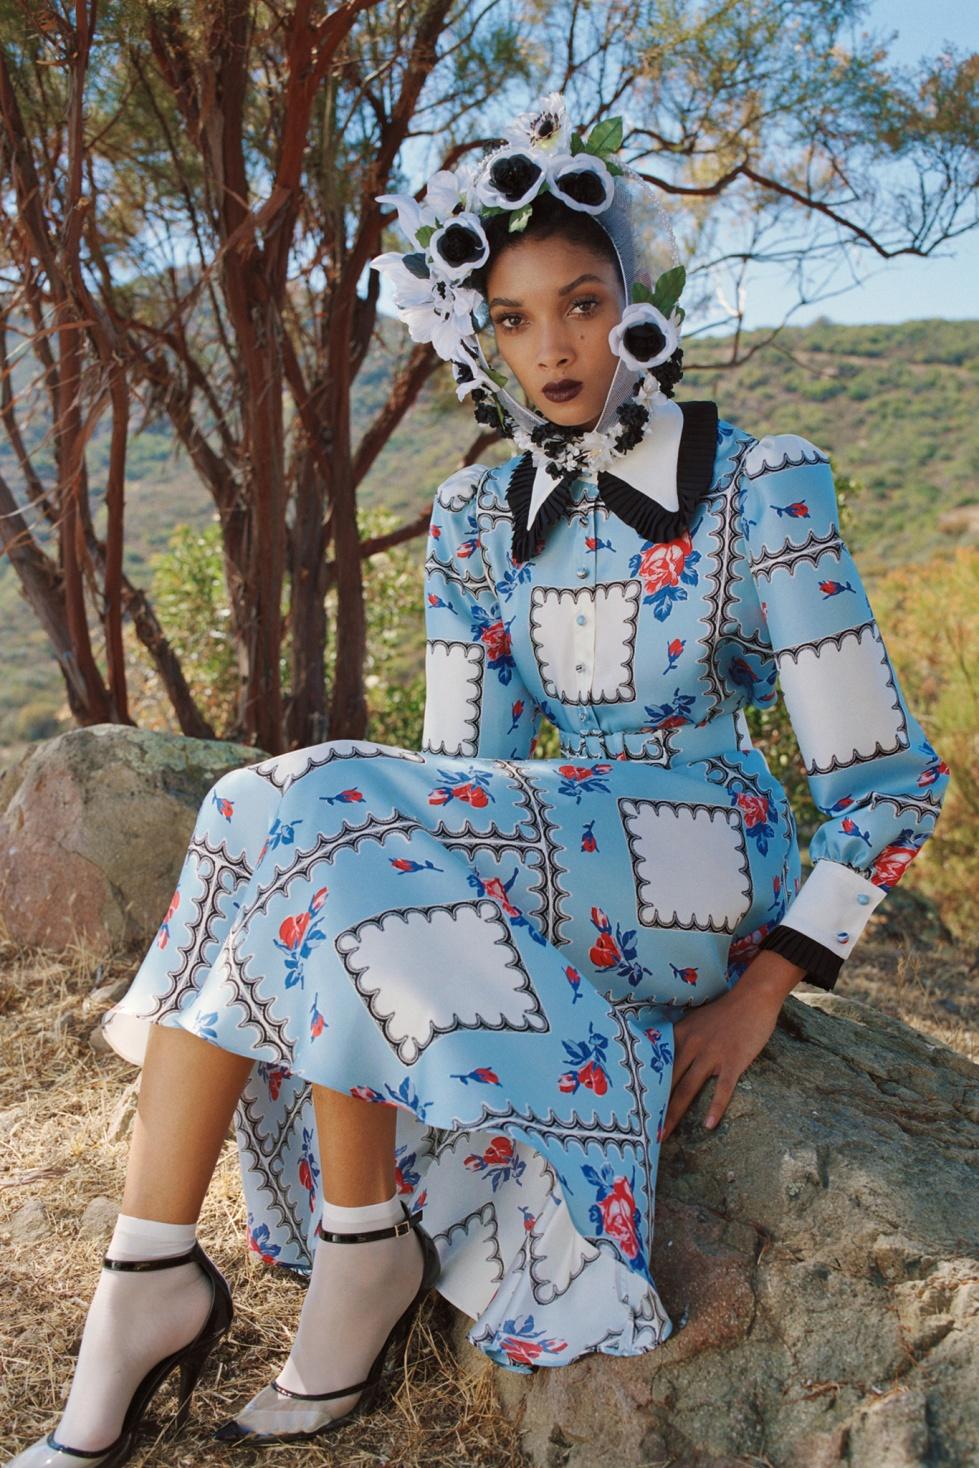 00001-rodarte-spring-21-rtw-credit-Daria-Kobayashi-Ritch blue handkerchief dress pynck.jpg